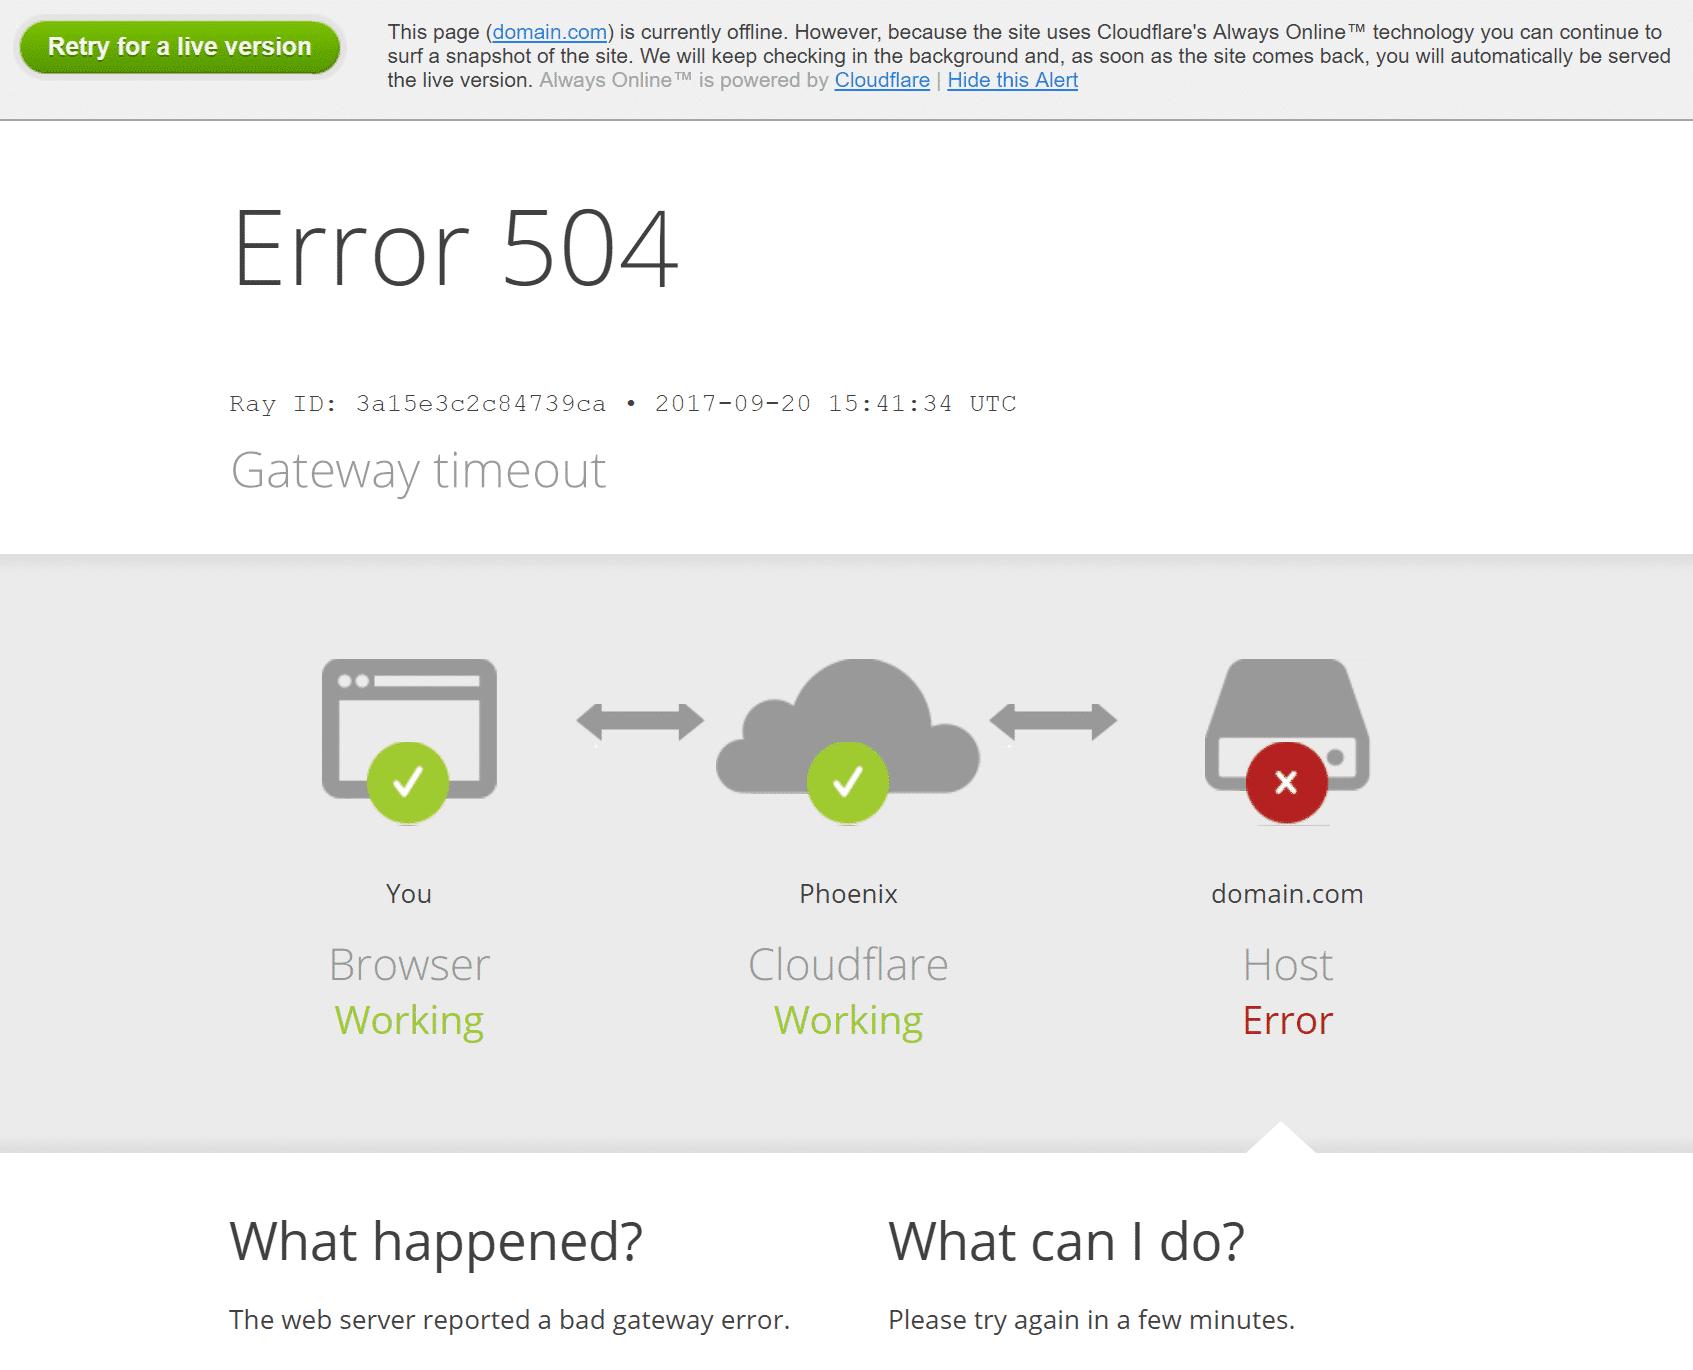 Cloudflare 504 gateway timeout fel hos värd